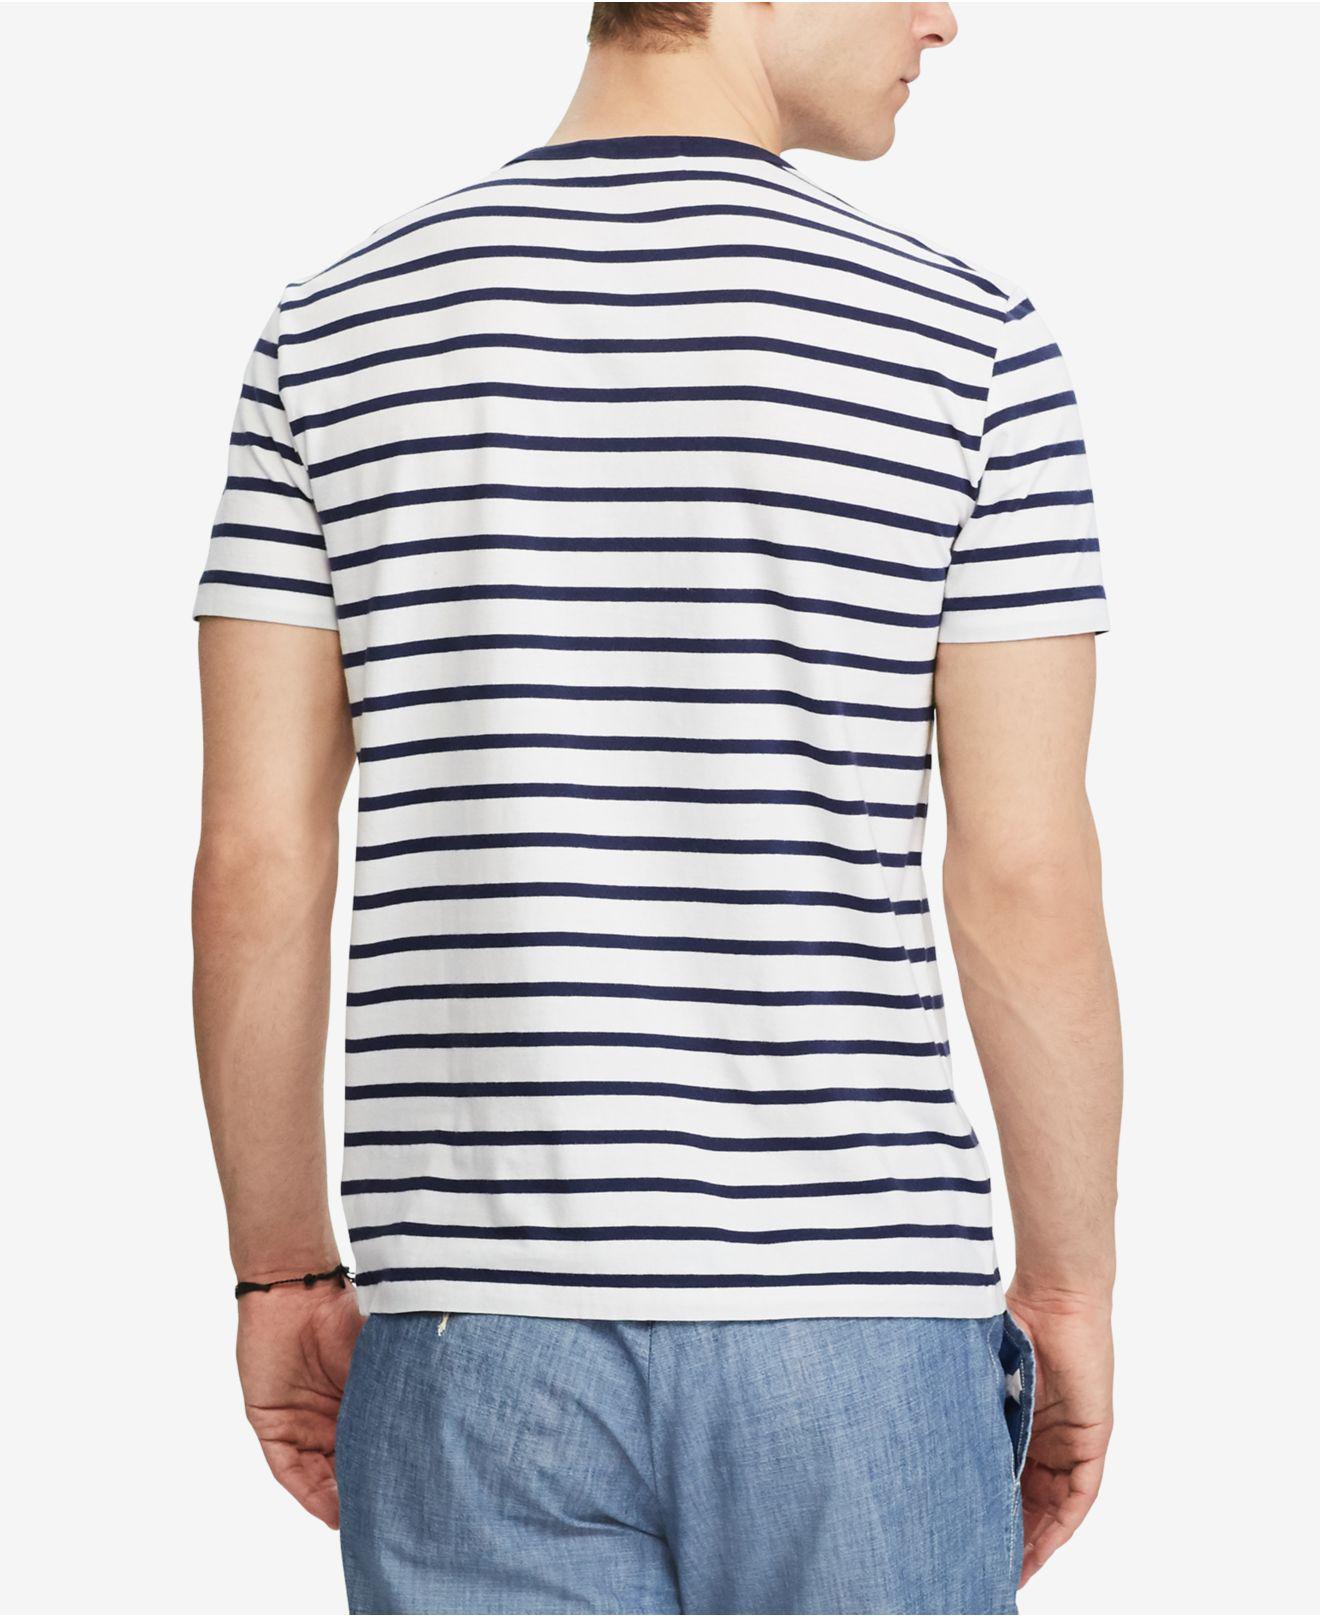 Men S Custom Slim Fit Striped Cotton T Shirt